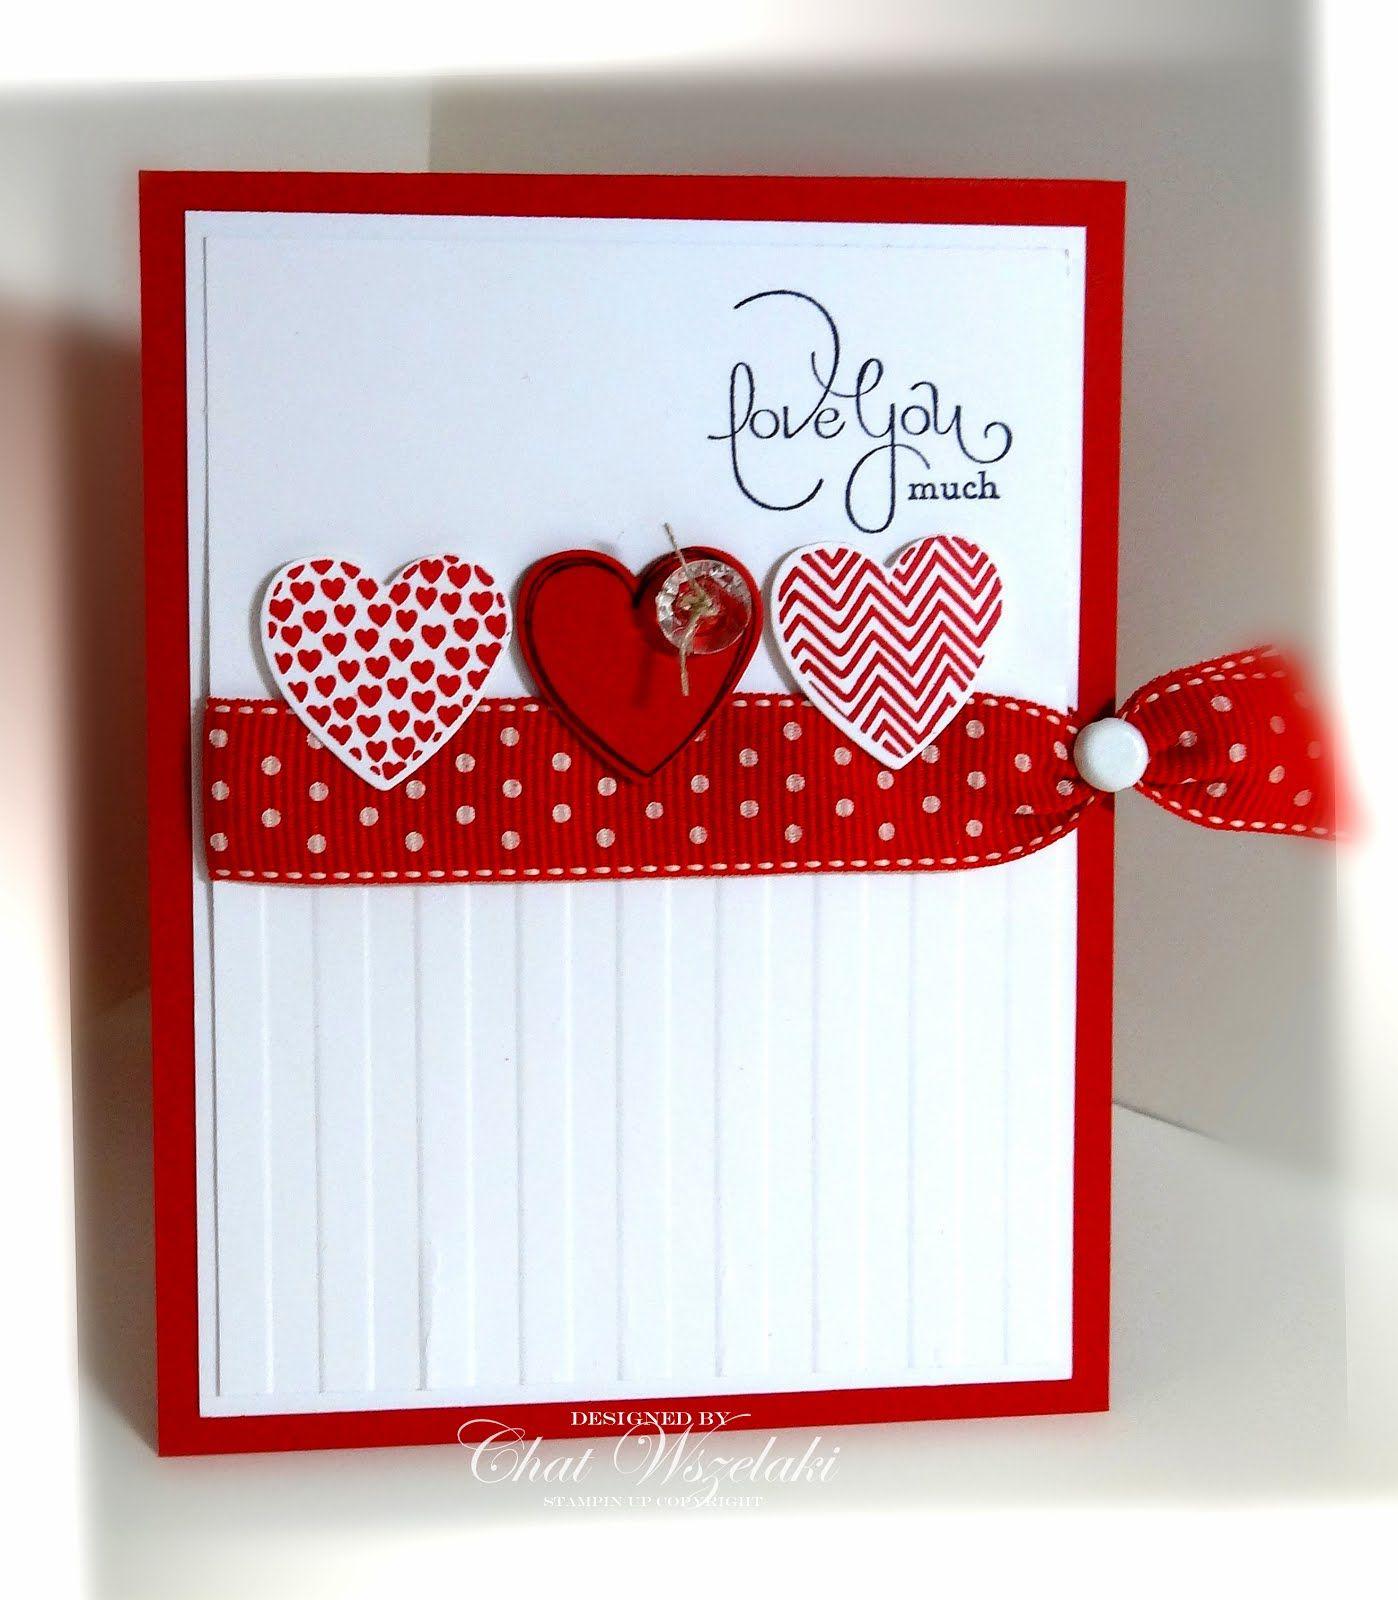 Considert It Cased 136 Valentines Cards Valentine Cards Handmade Cards Handmade